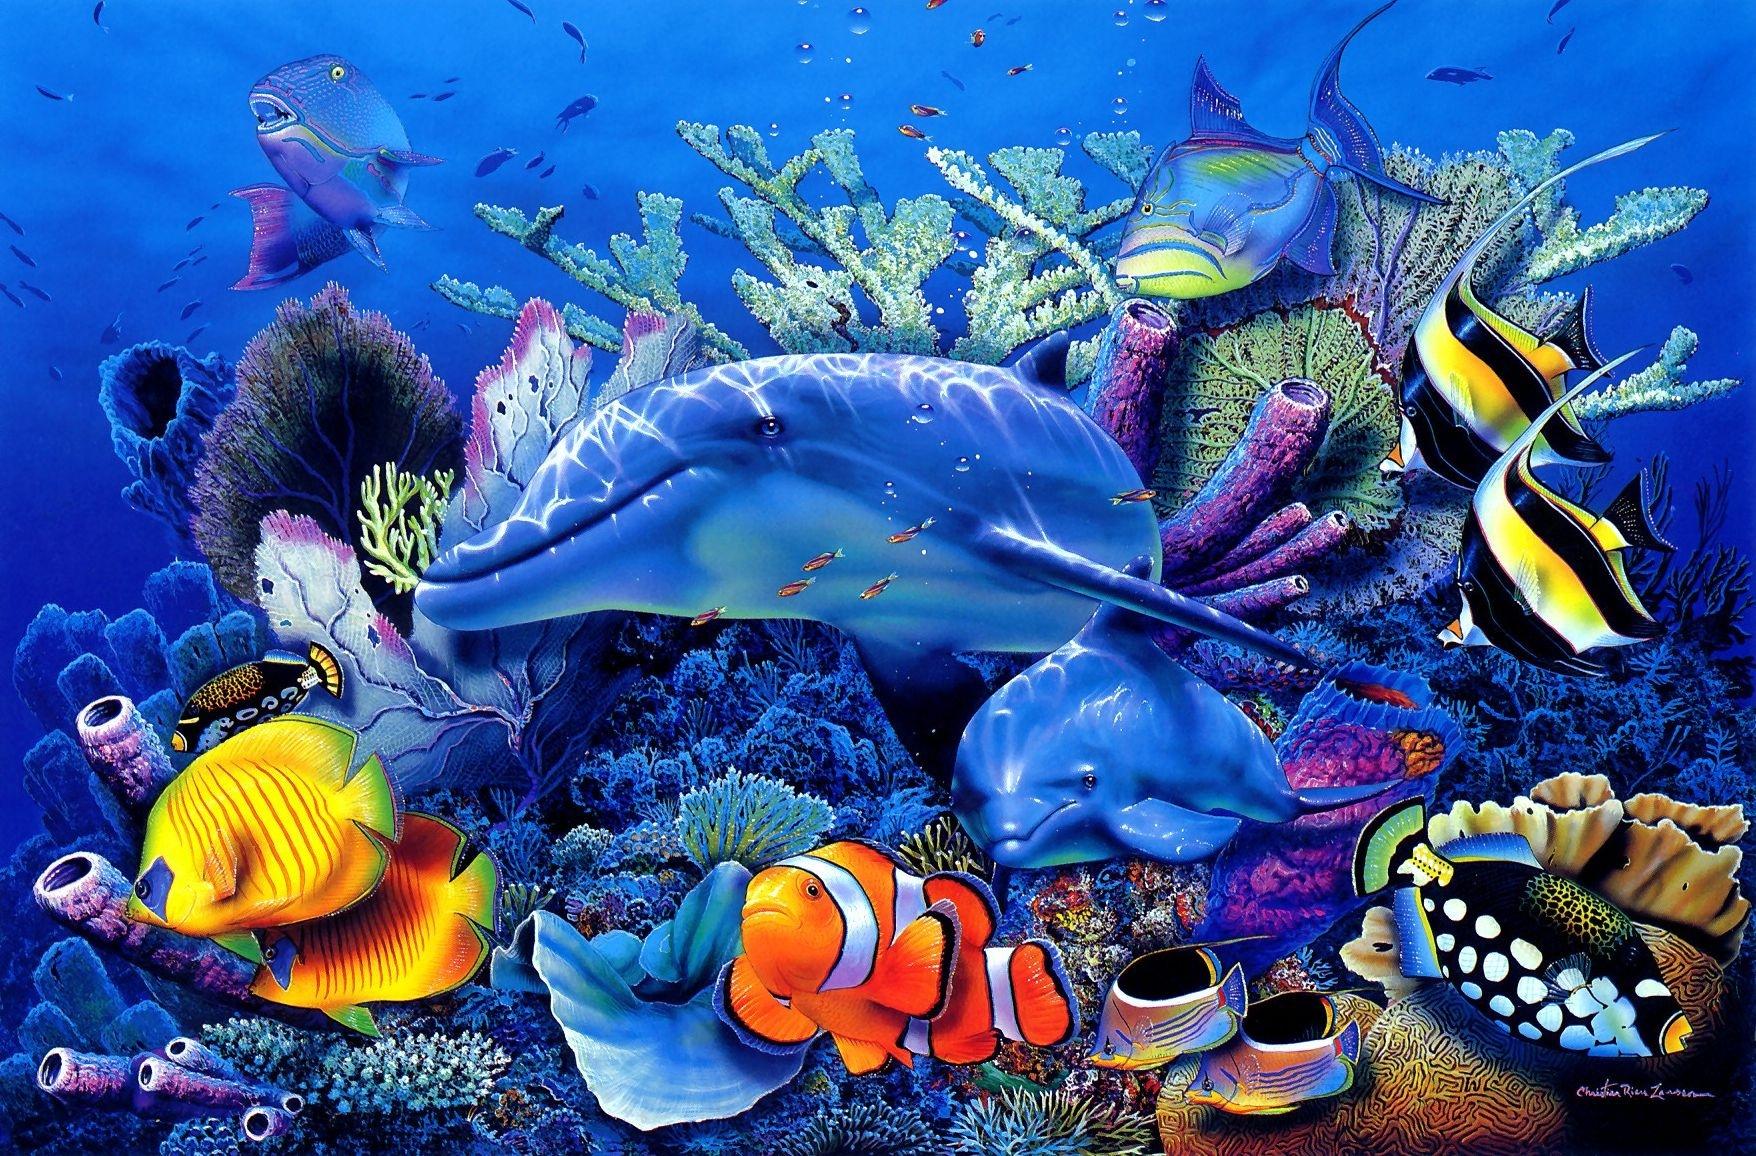 Wallpaper 1756x1156 Px Art Christian Corals Dolphin